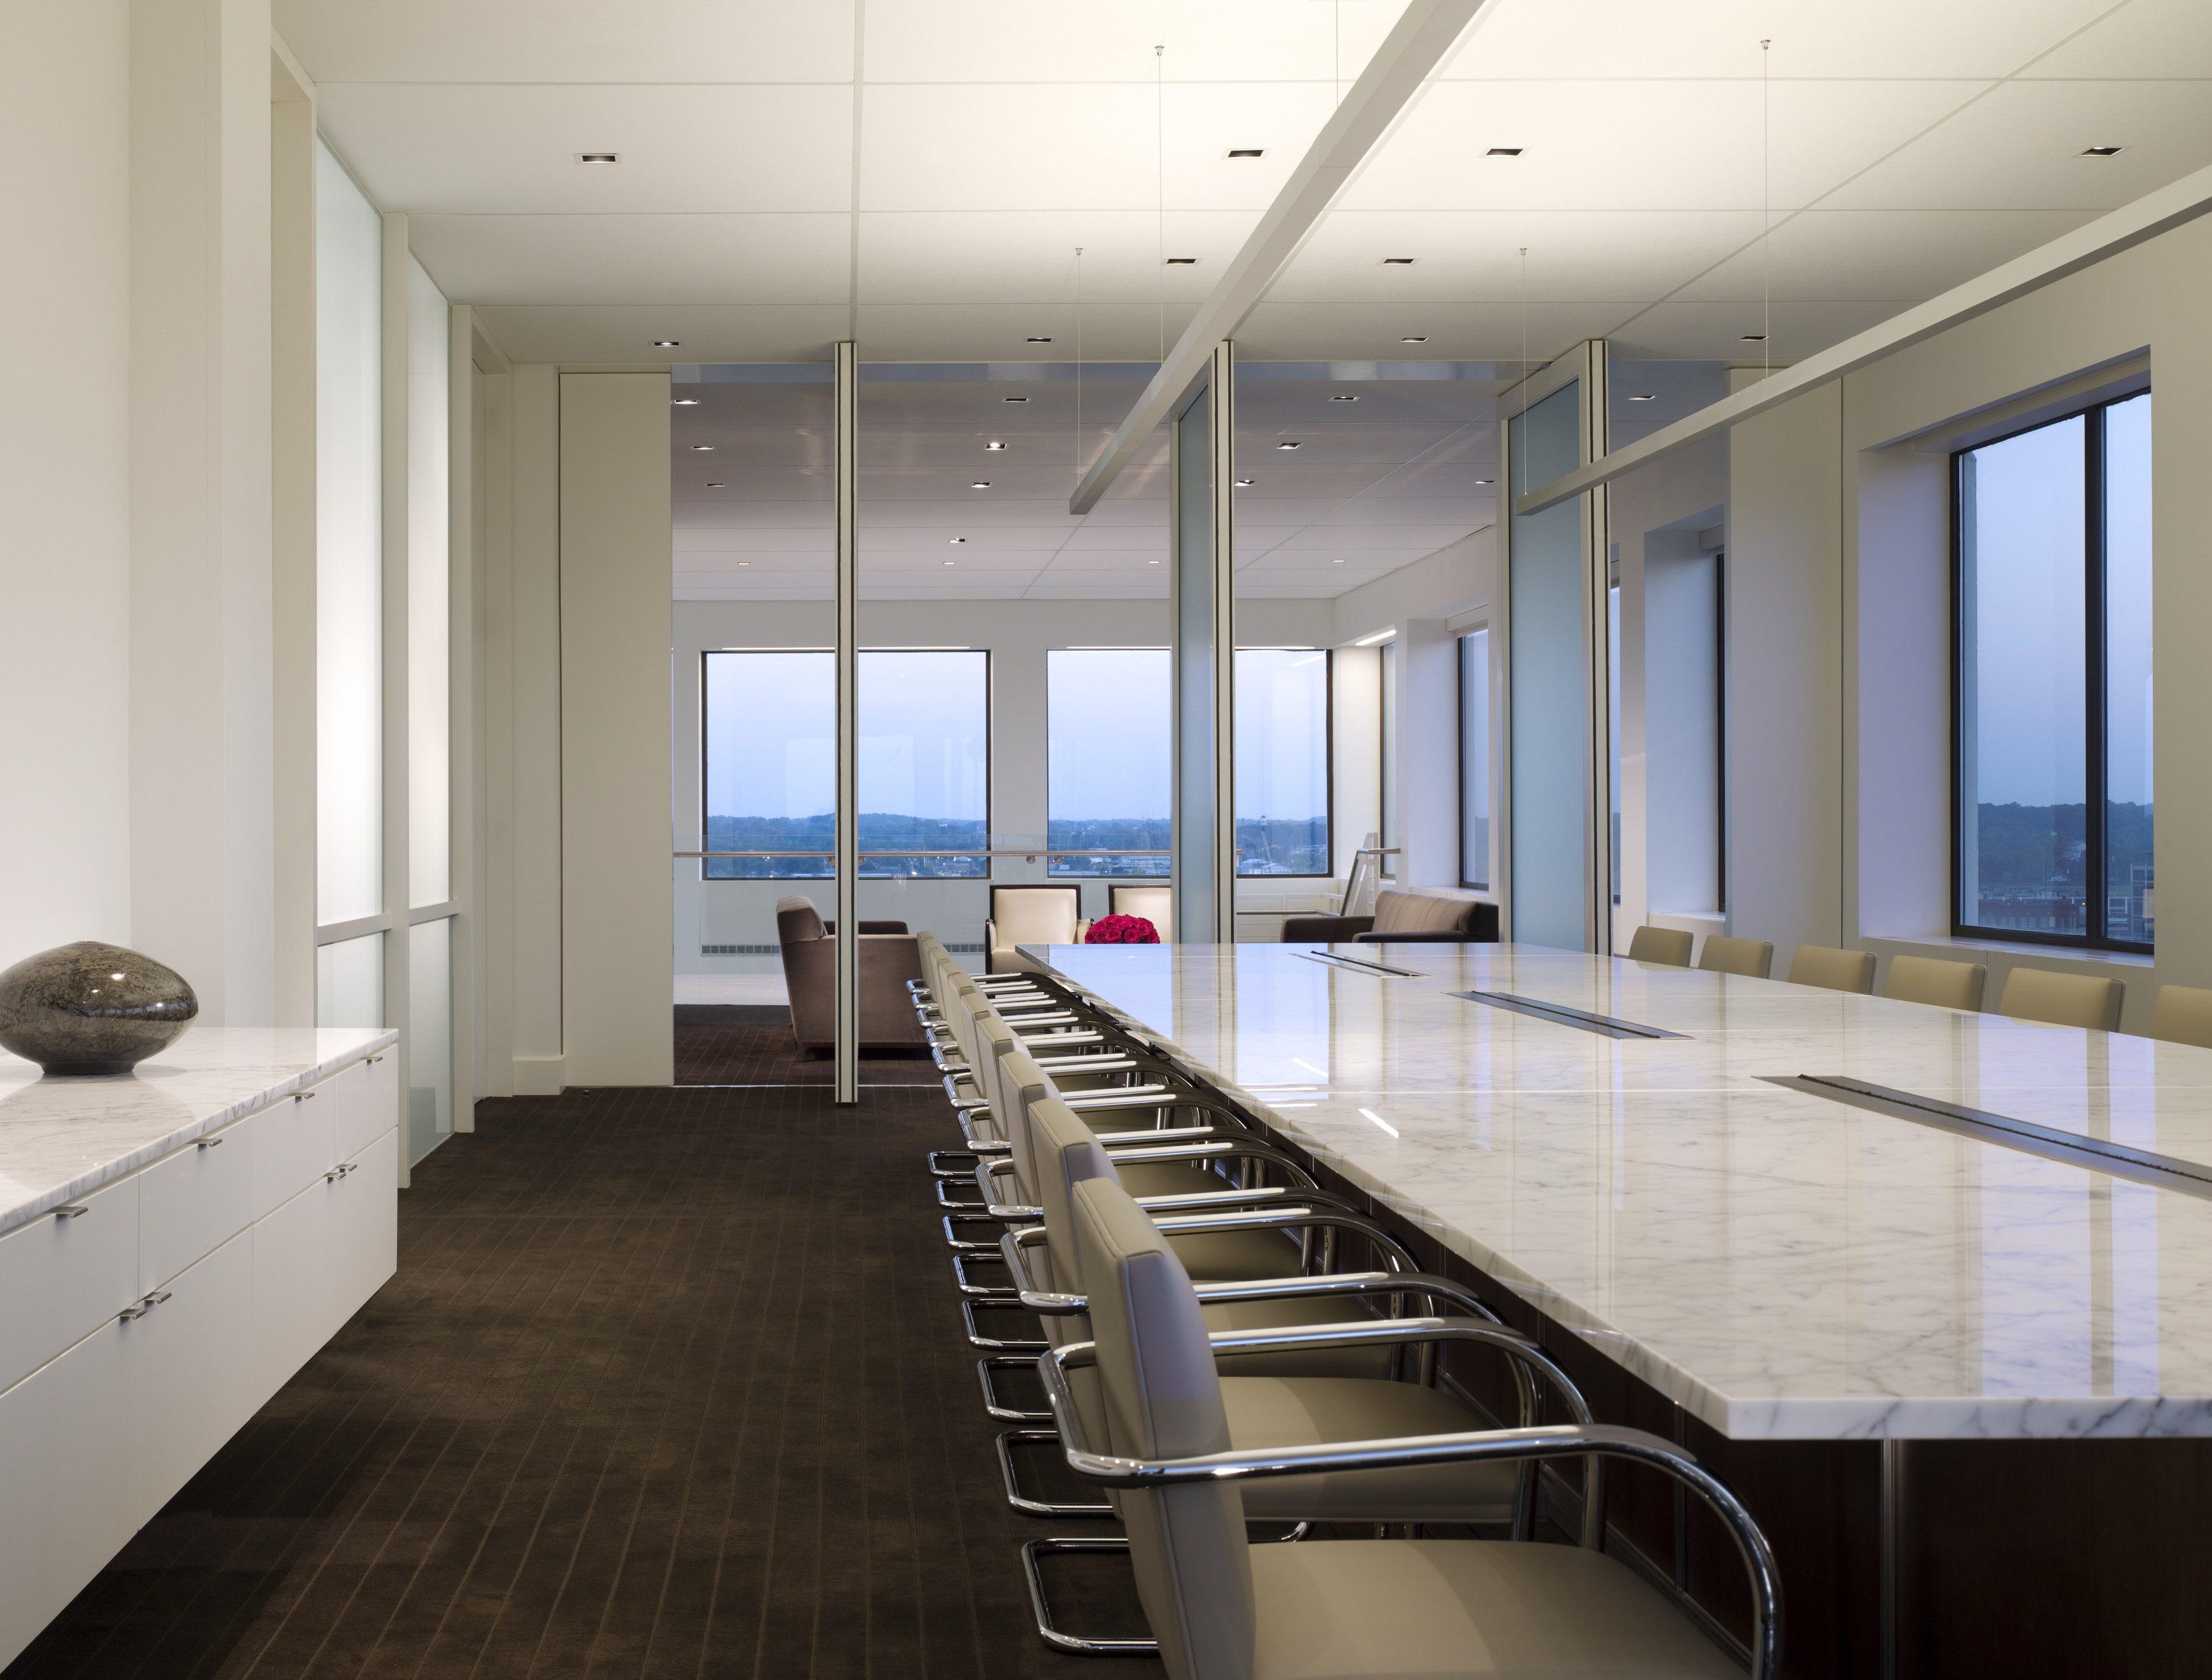 Law office 3 board rm kelly braun design for Professional room designer